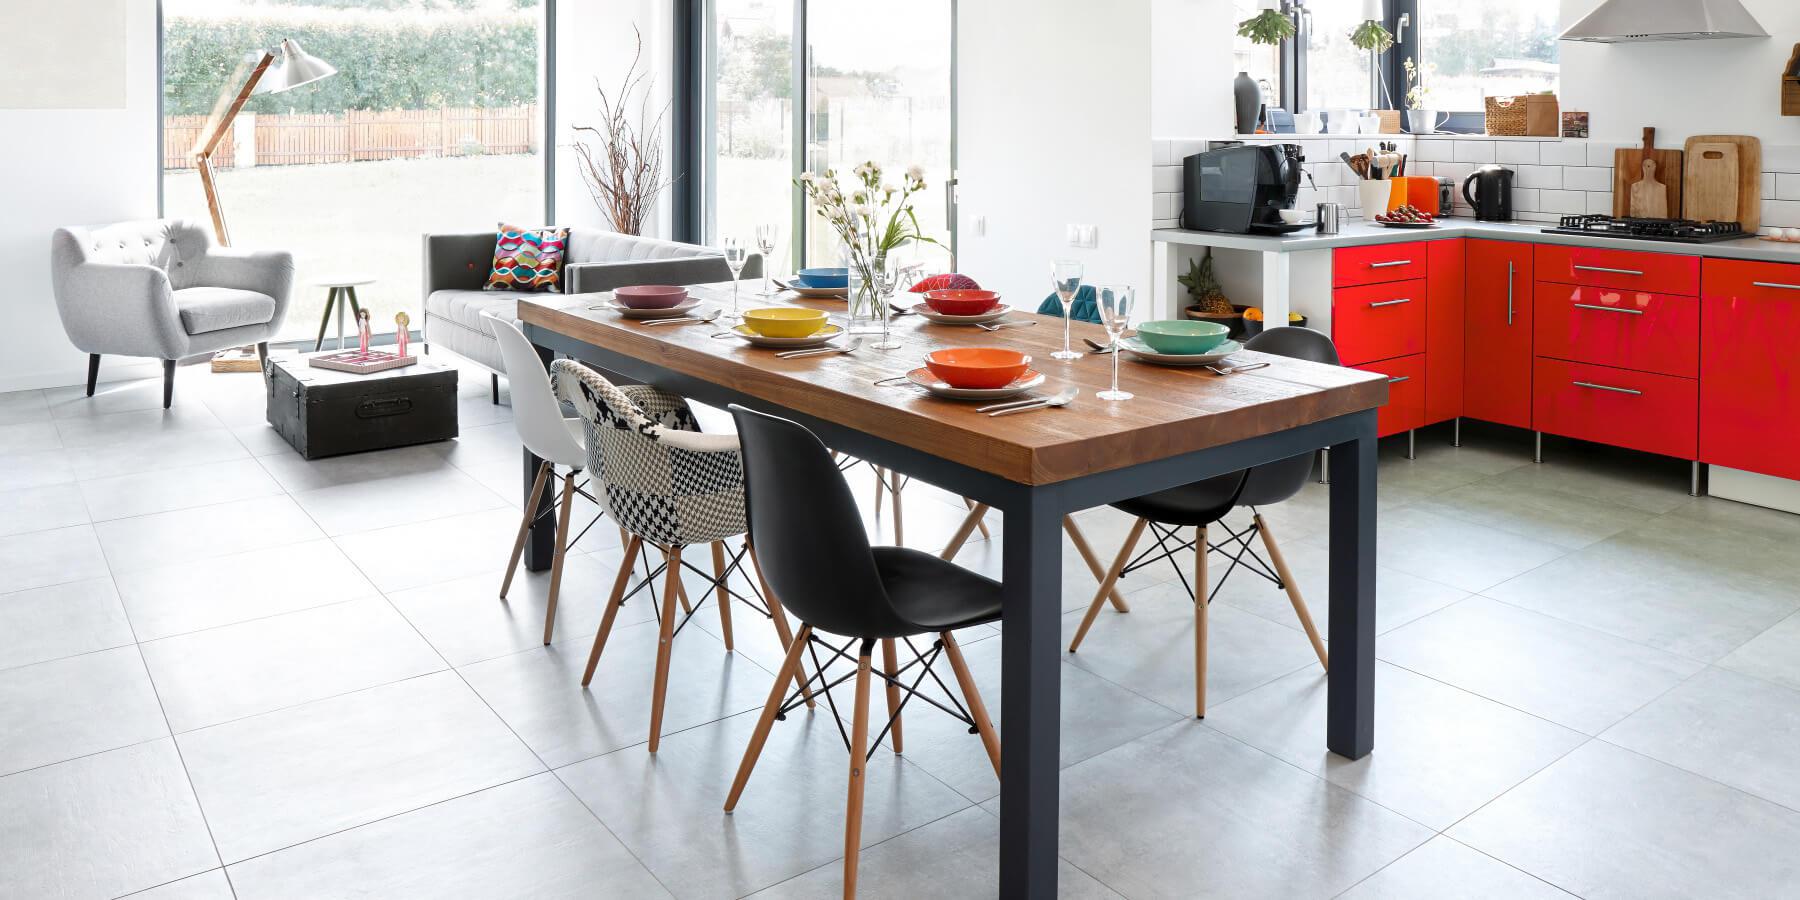 floor plan for dining room